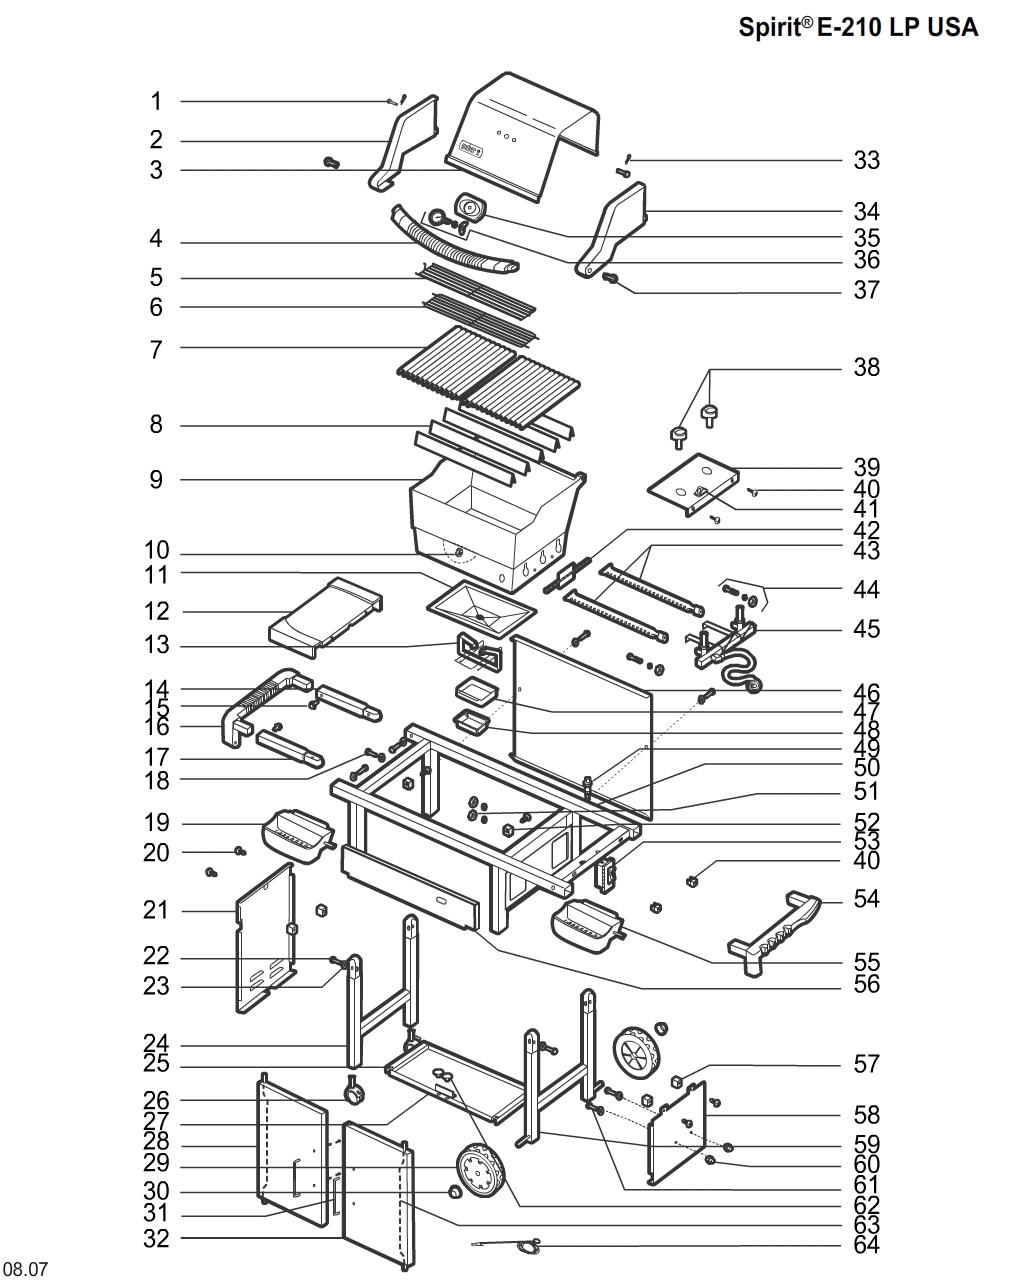 Schematic Image 3711001